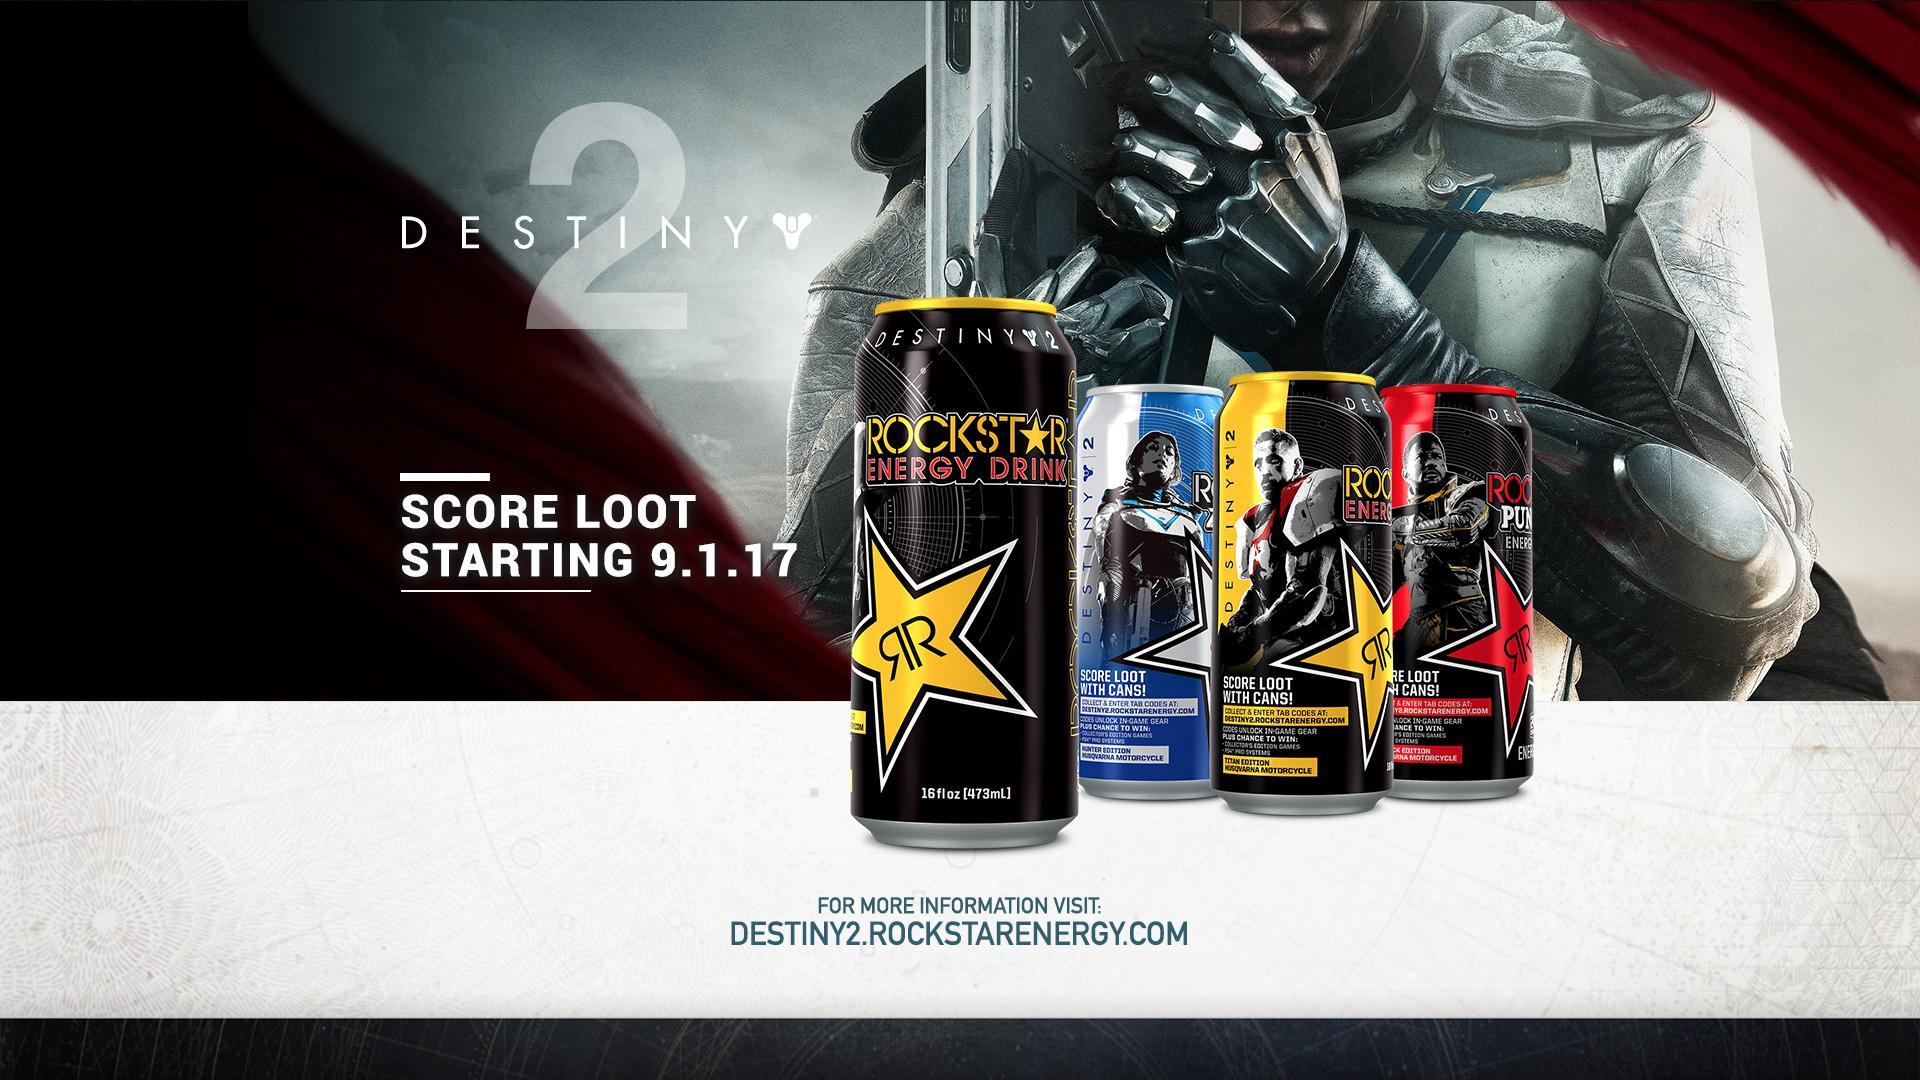 Destiny 2 Coming Soon